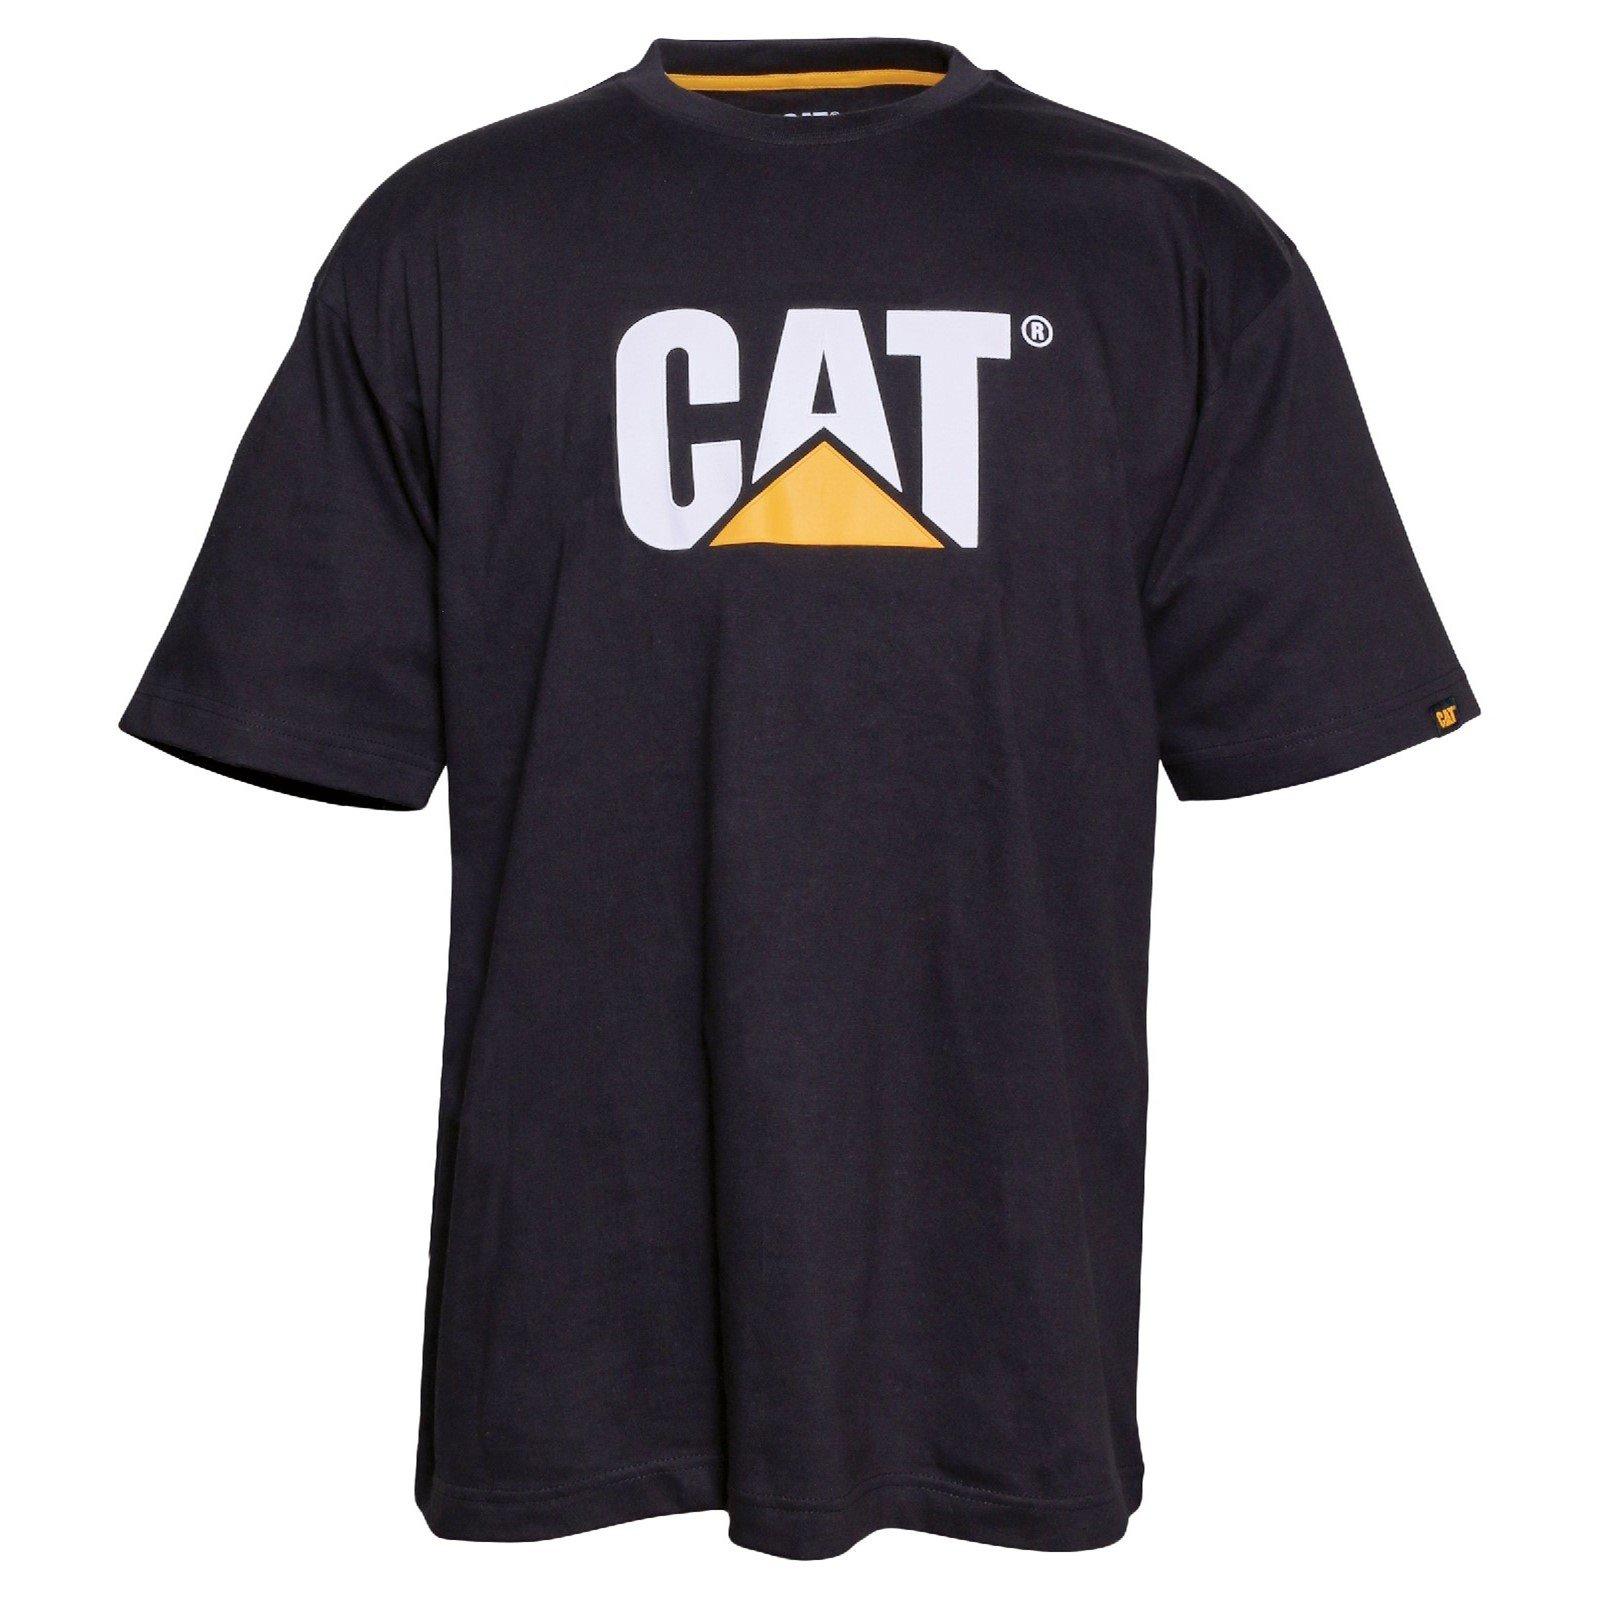 Caterpillar Men's Trademark Logo T-Shirt Various Colours 25301-42086 - Black 4X